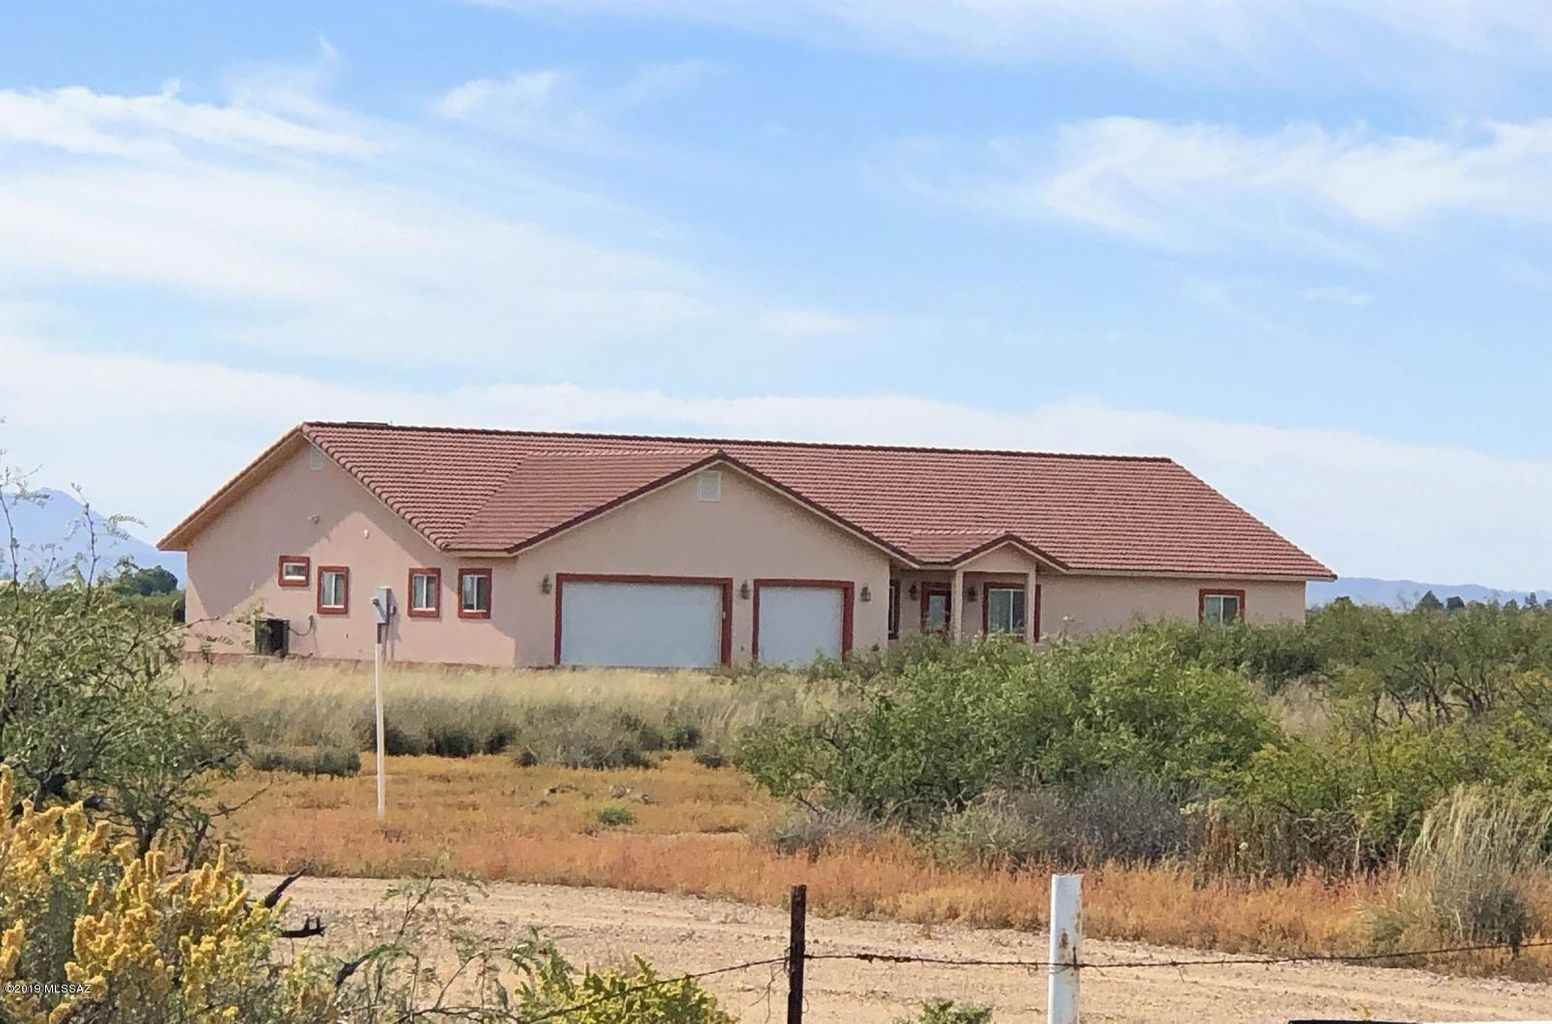 Custom 3410 Sq ft 4 bedroom, 3 bathroom home near Willcox AZ